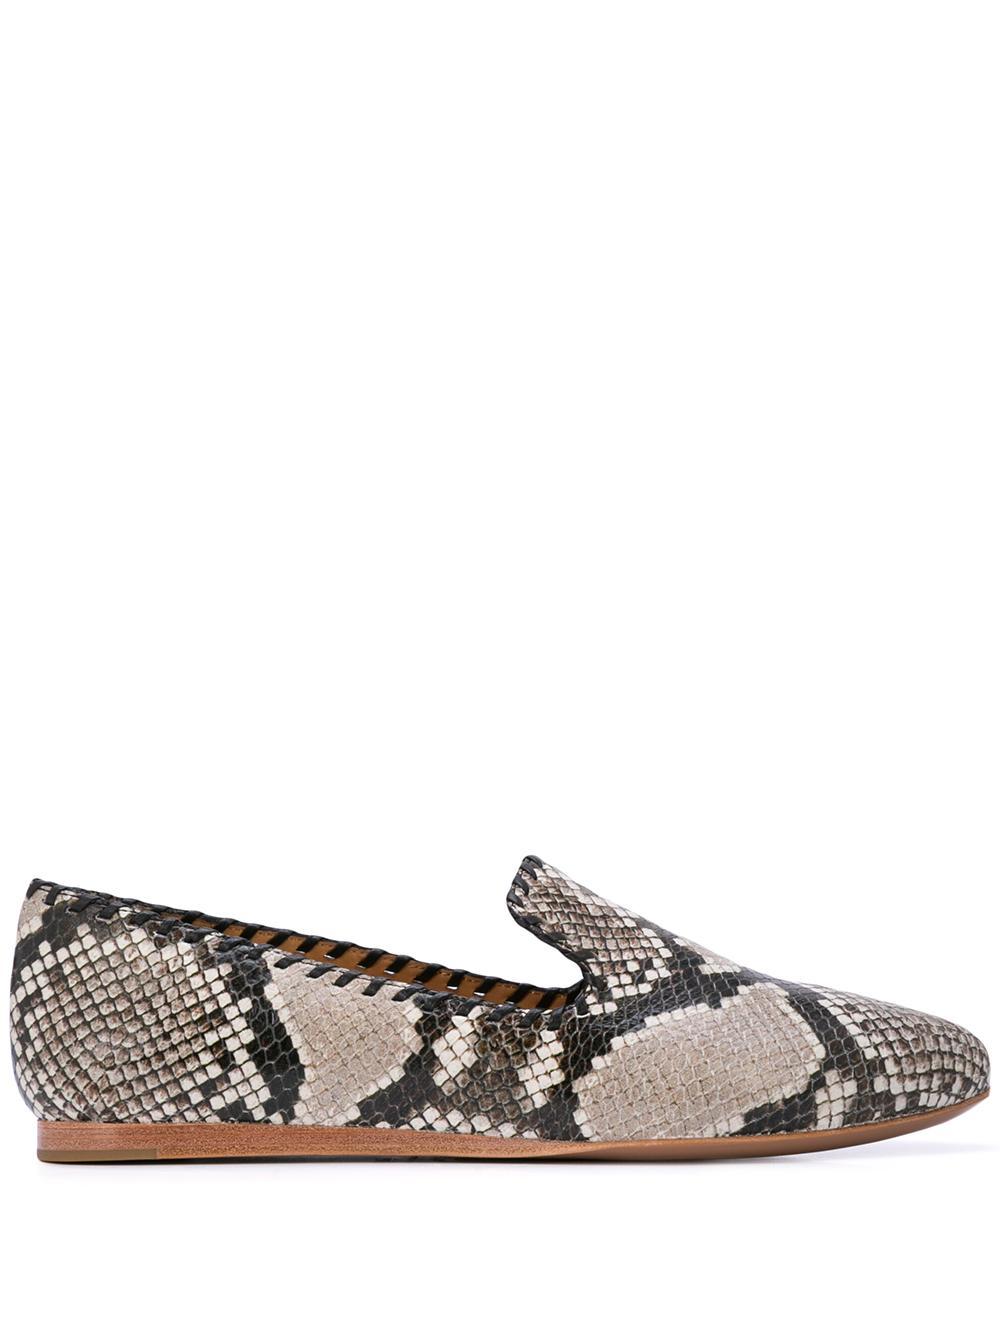 Flat Python Loafer With Whip Stitch Item # F190607EM